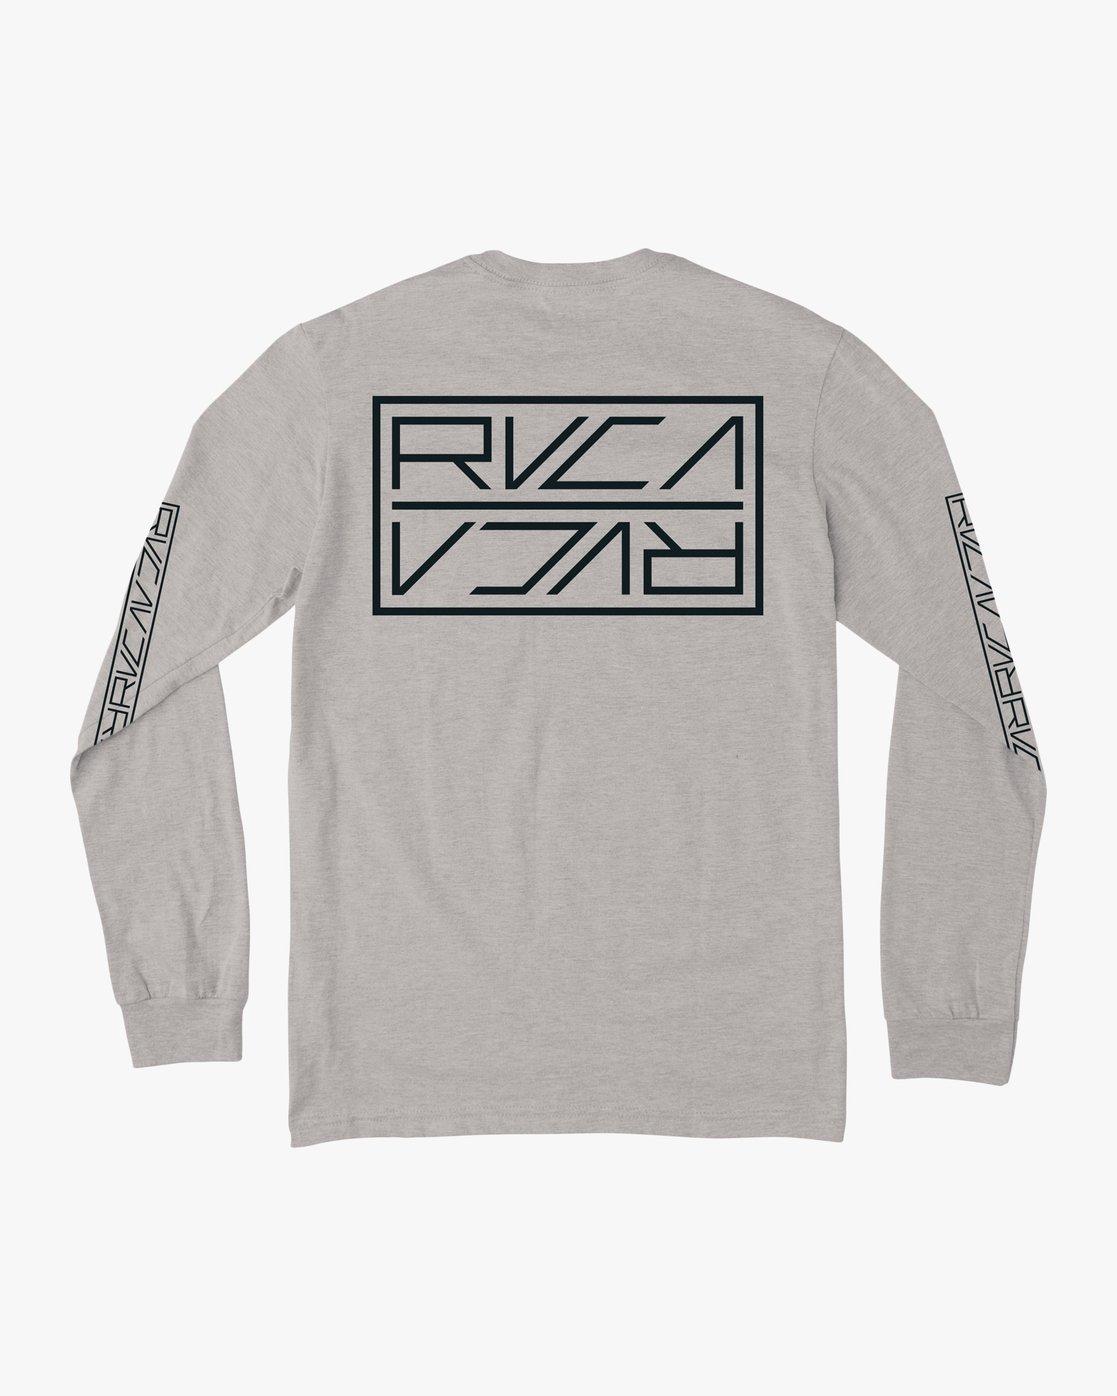 Reflector Long Sleeve T-Shirt